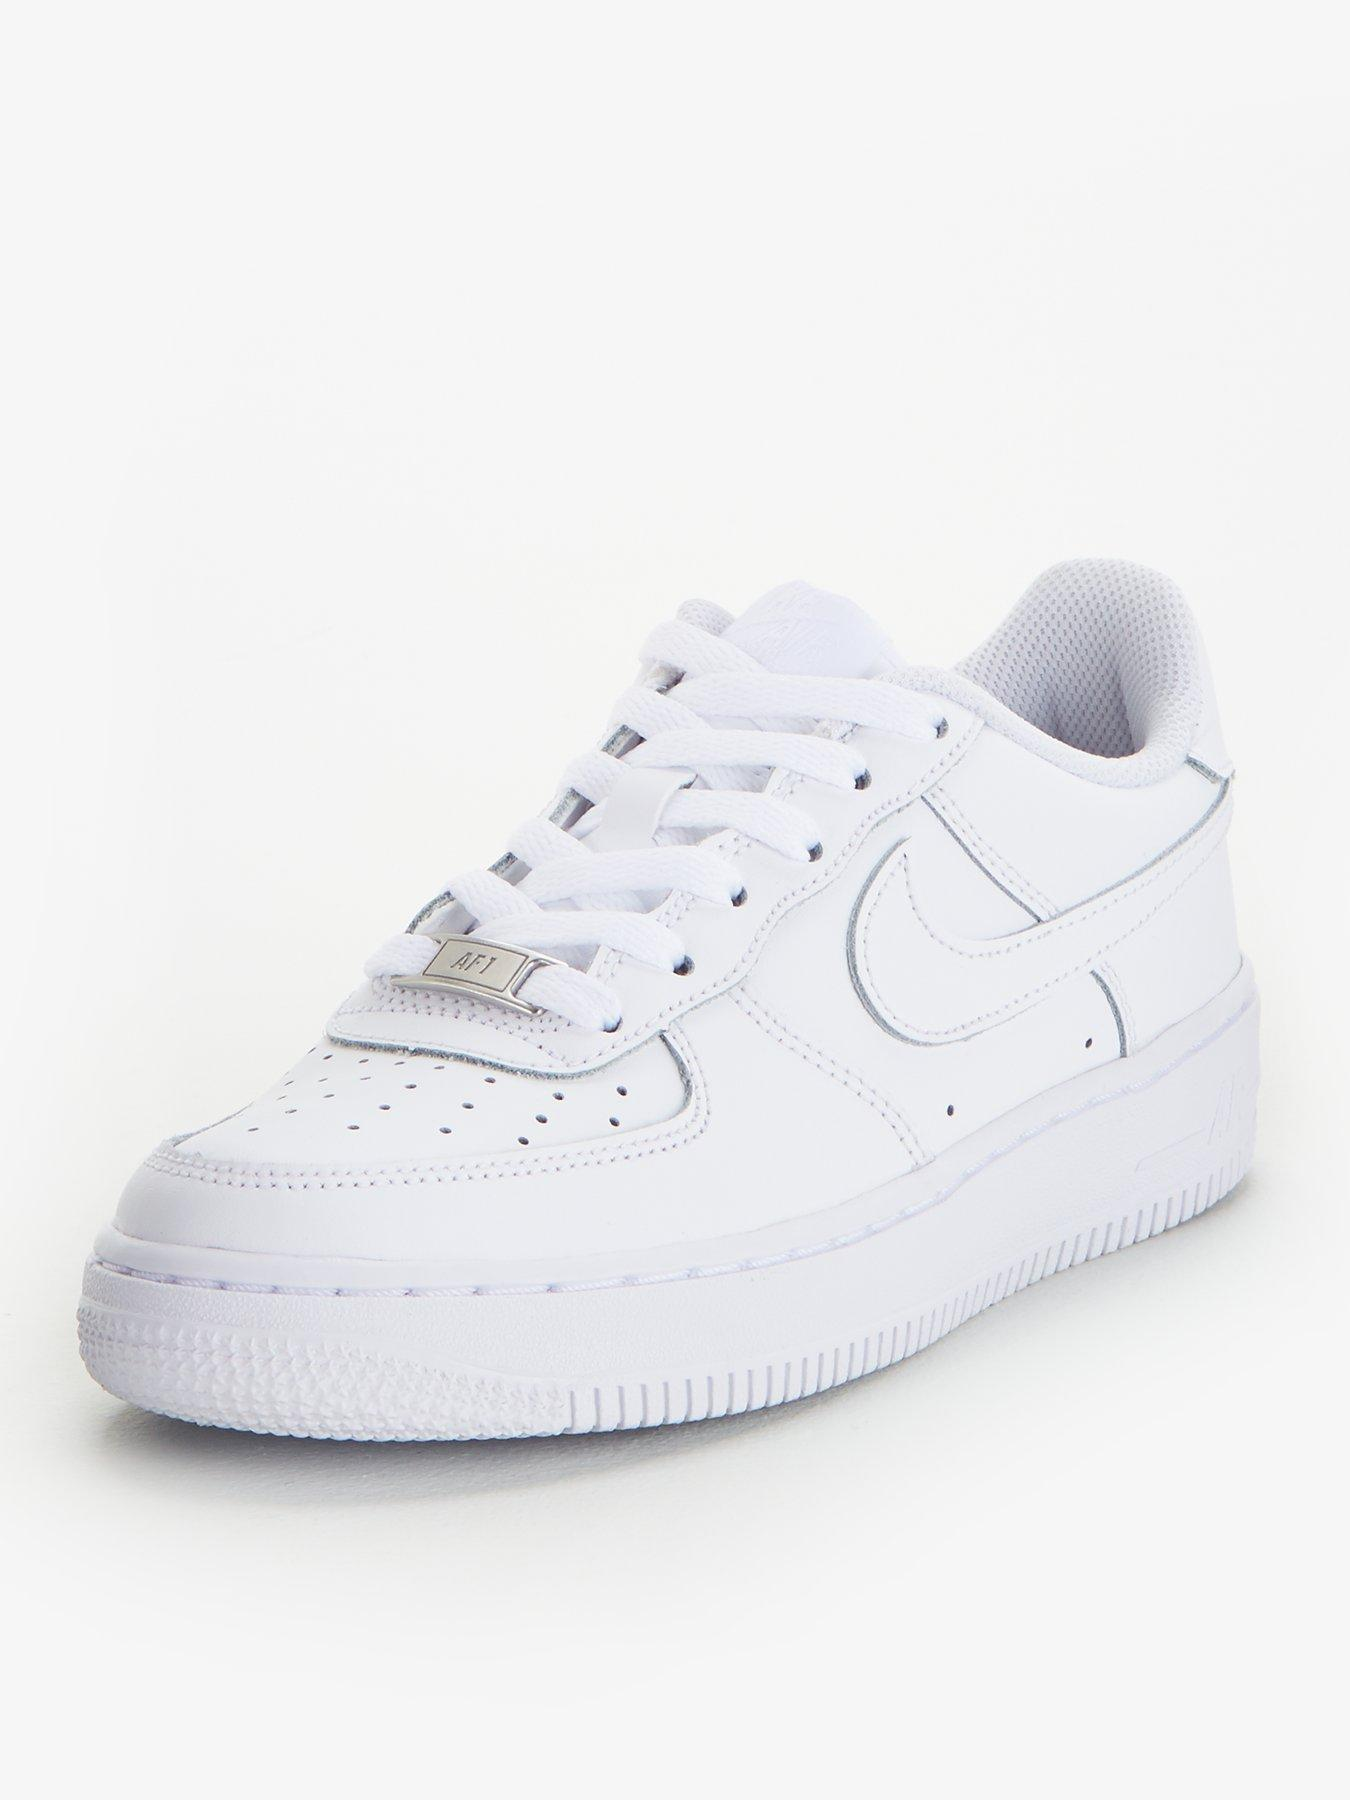 Nike Air Force 1 (GS) Junior Shoe